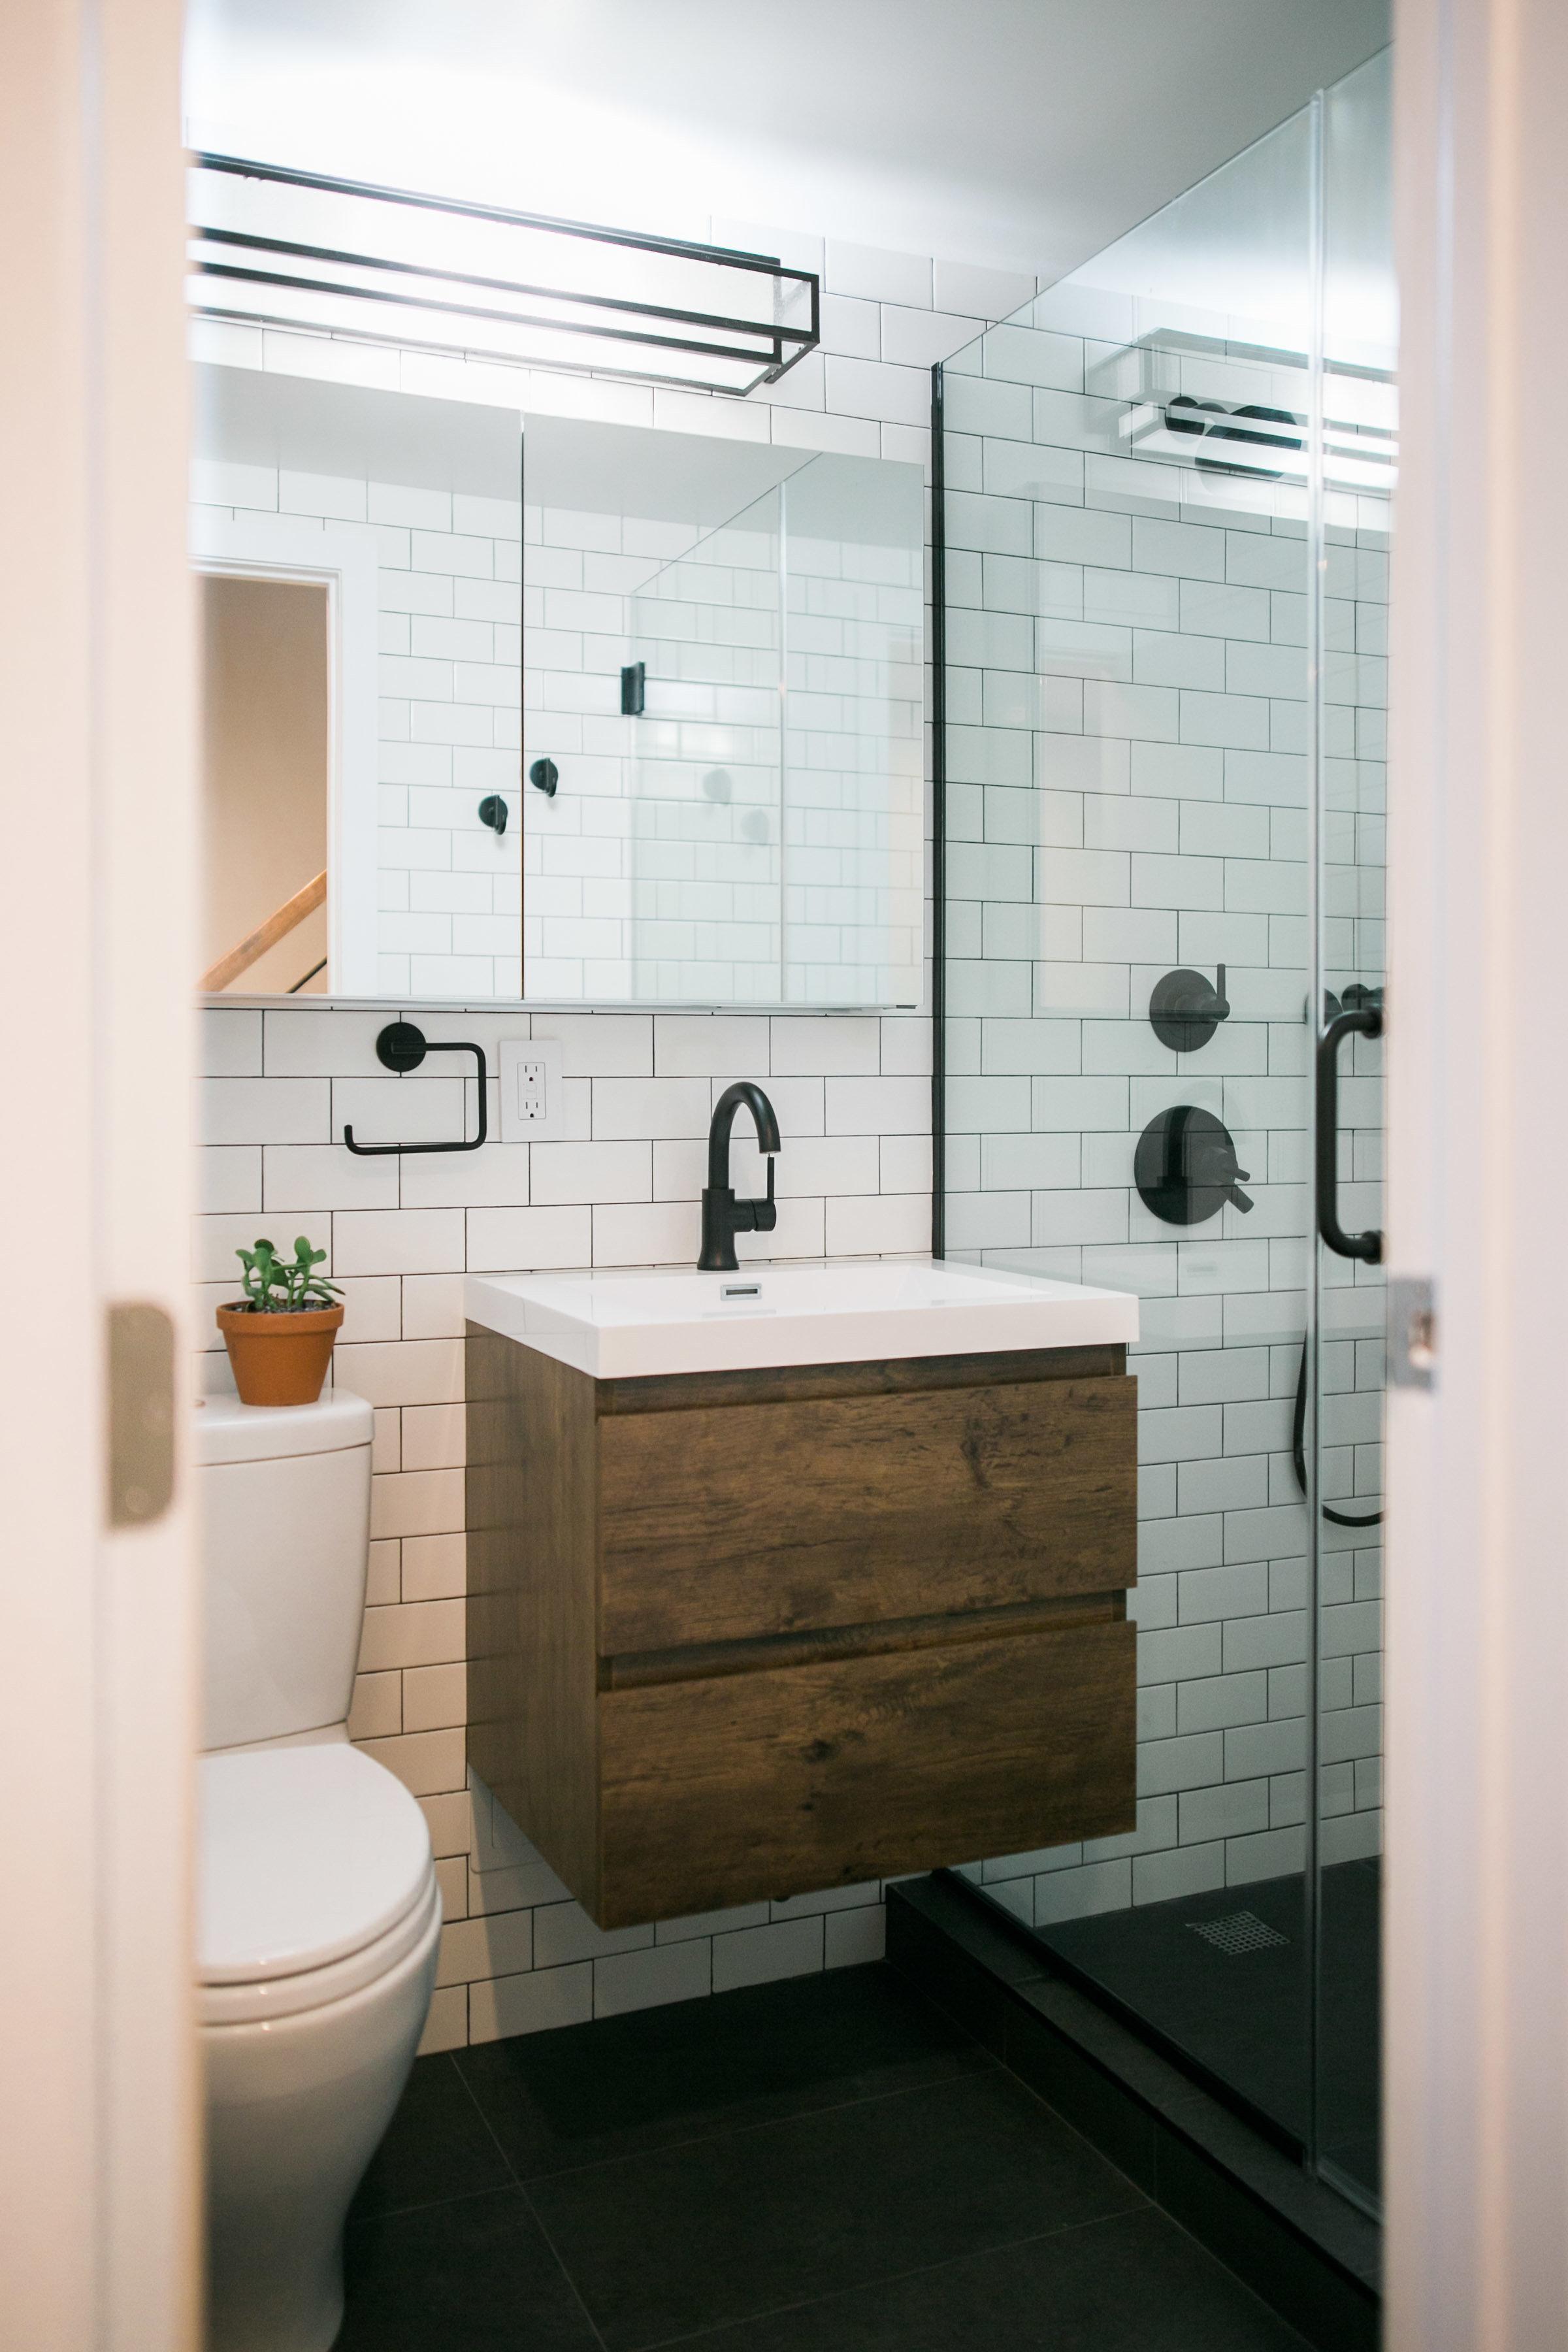 Location2_Bathroom_005 (2).jpg